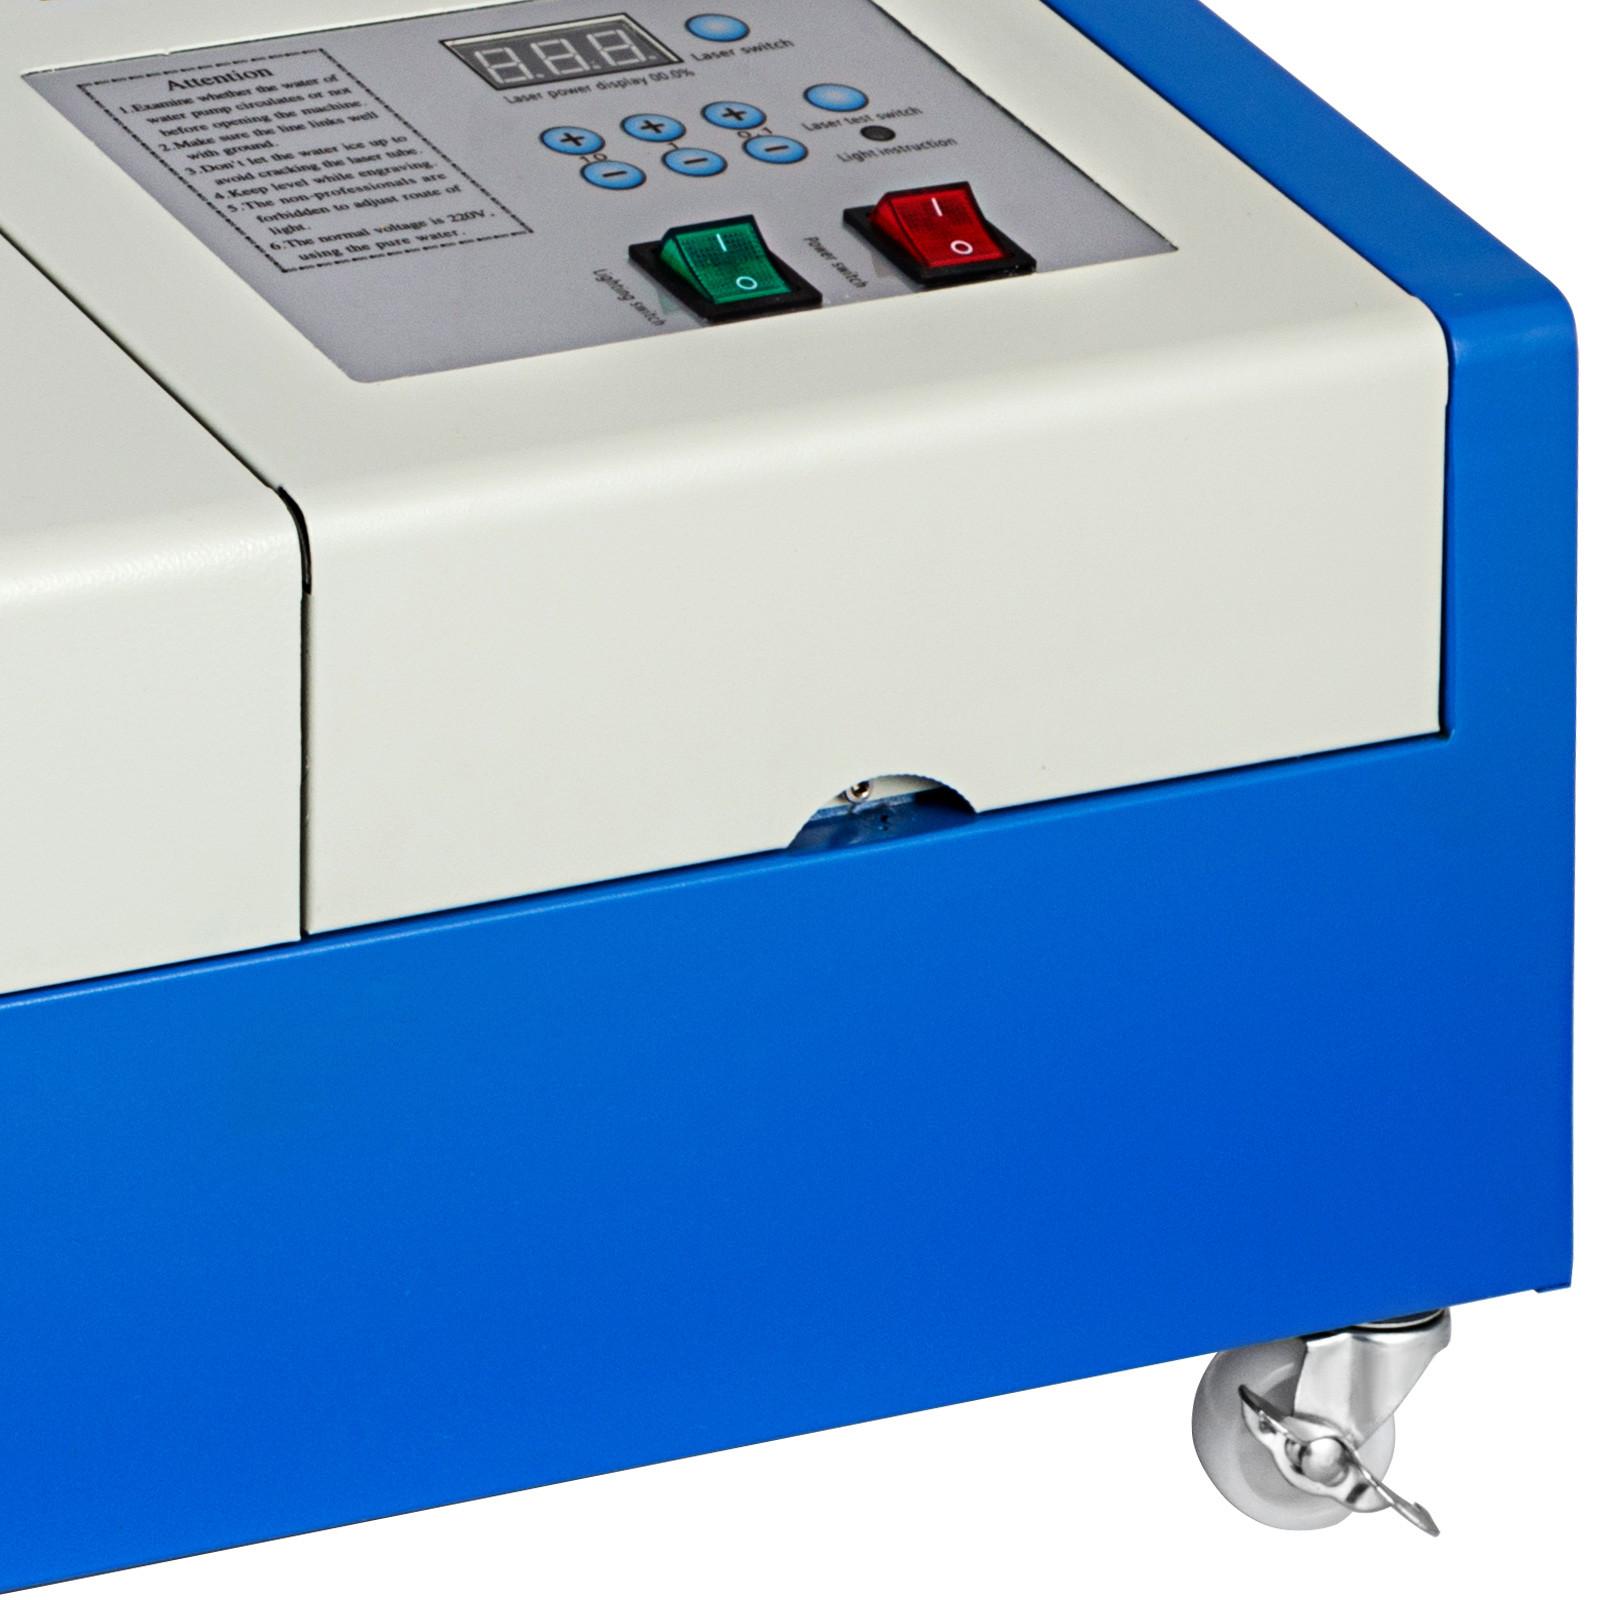 Macchina-per-Incisione-Laser-CO2-40-130W-Asse-Rotante-Tagliatrice-Incisore miniatura 103